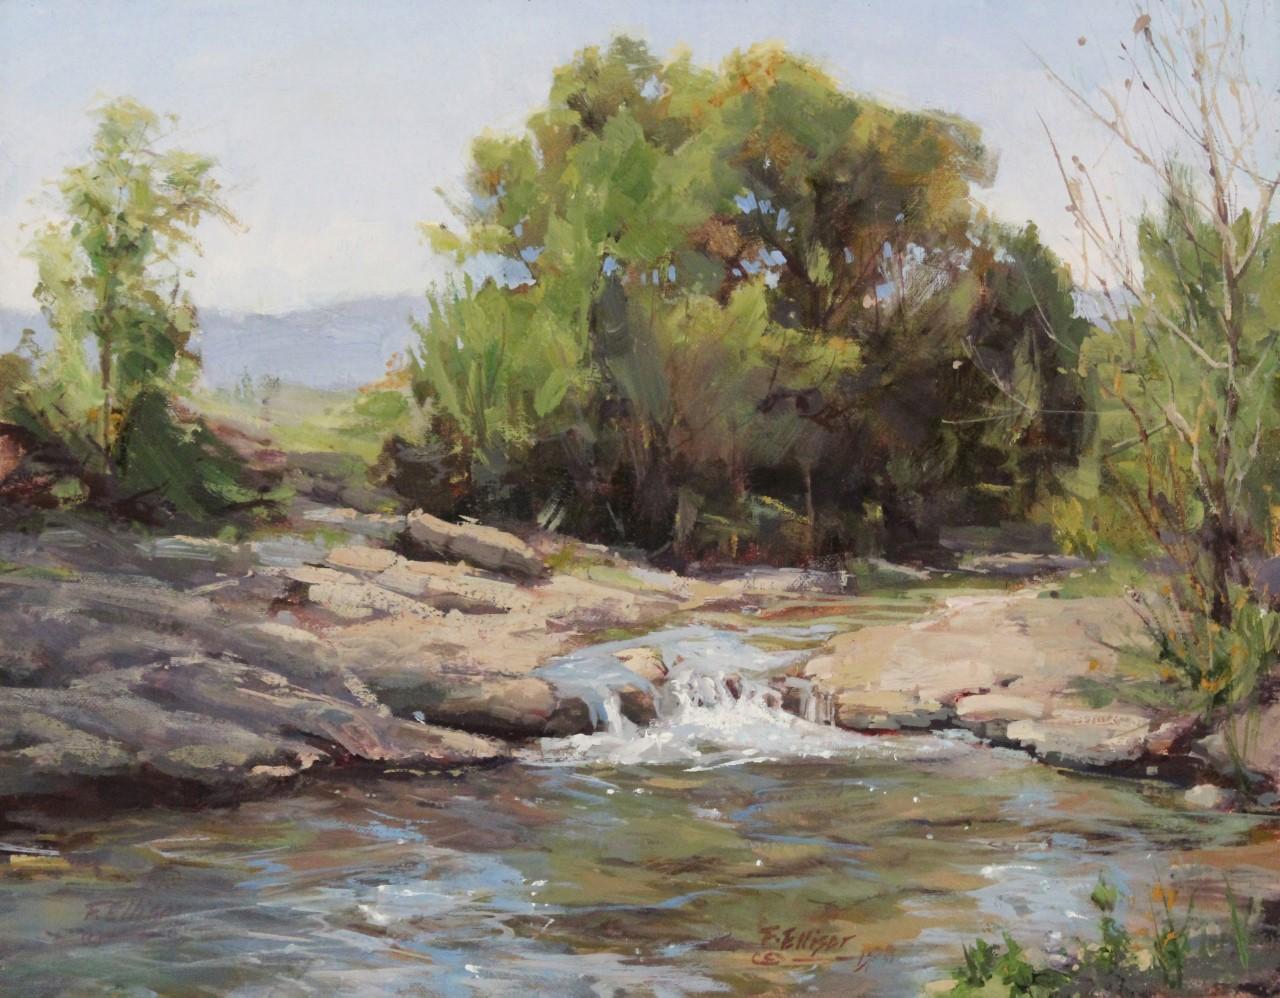 Fran Ellisor - A Spring Creek